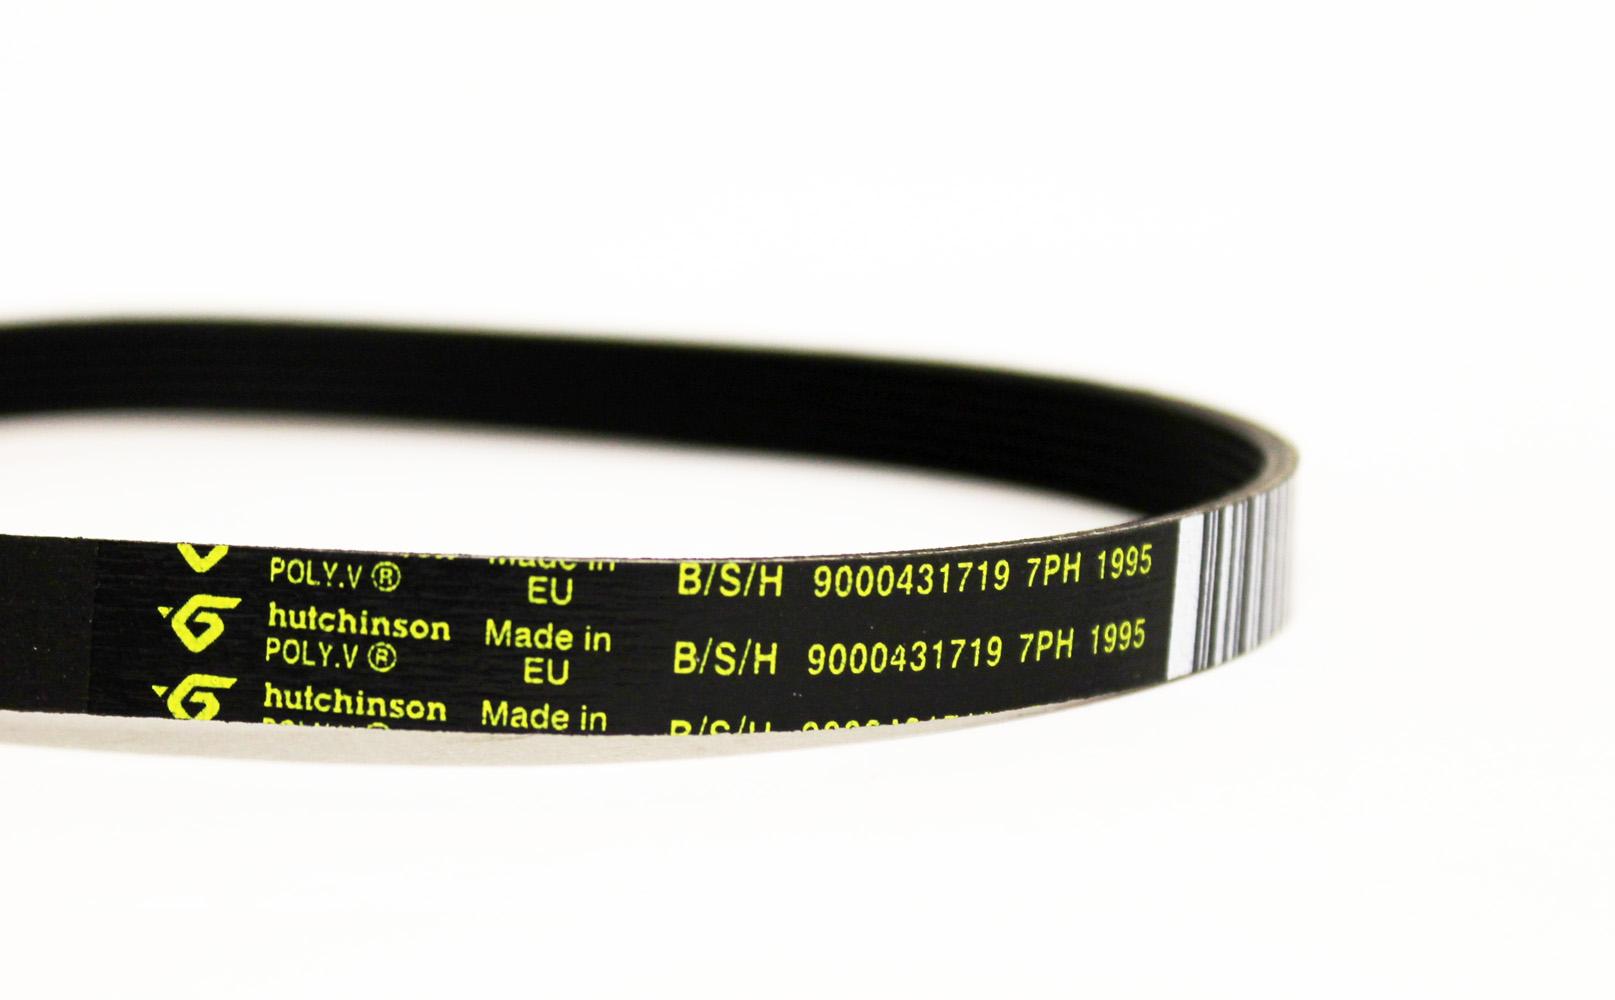 Description of BELT 9000431719 7PH 1995